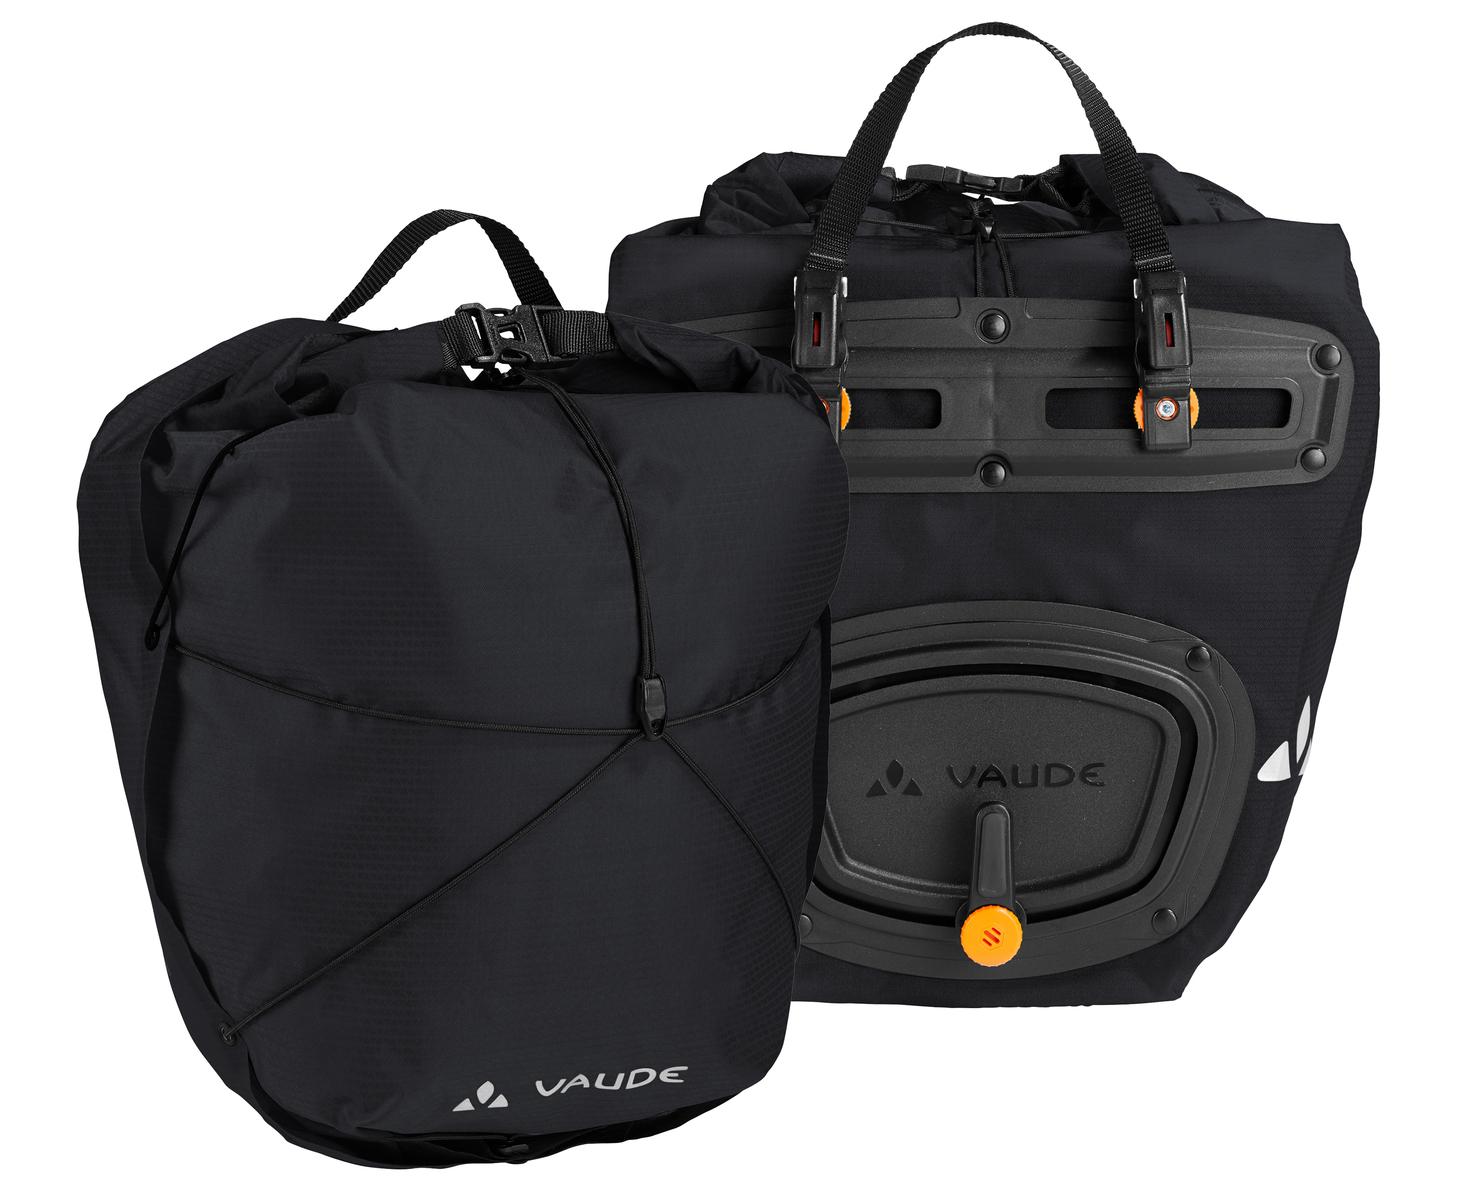 VAUDE Aqua Front Light black  - 2-Rad-Sport Wehrle